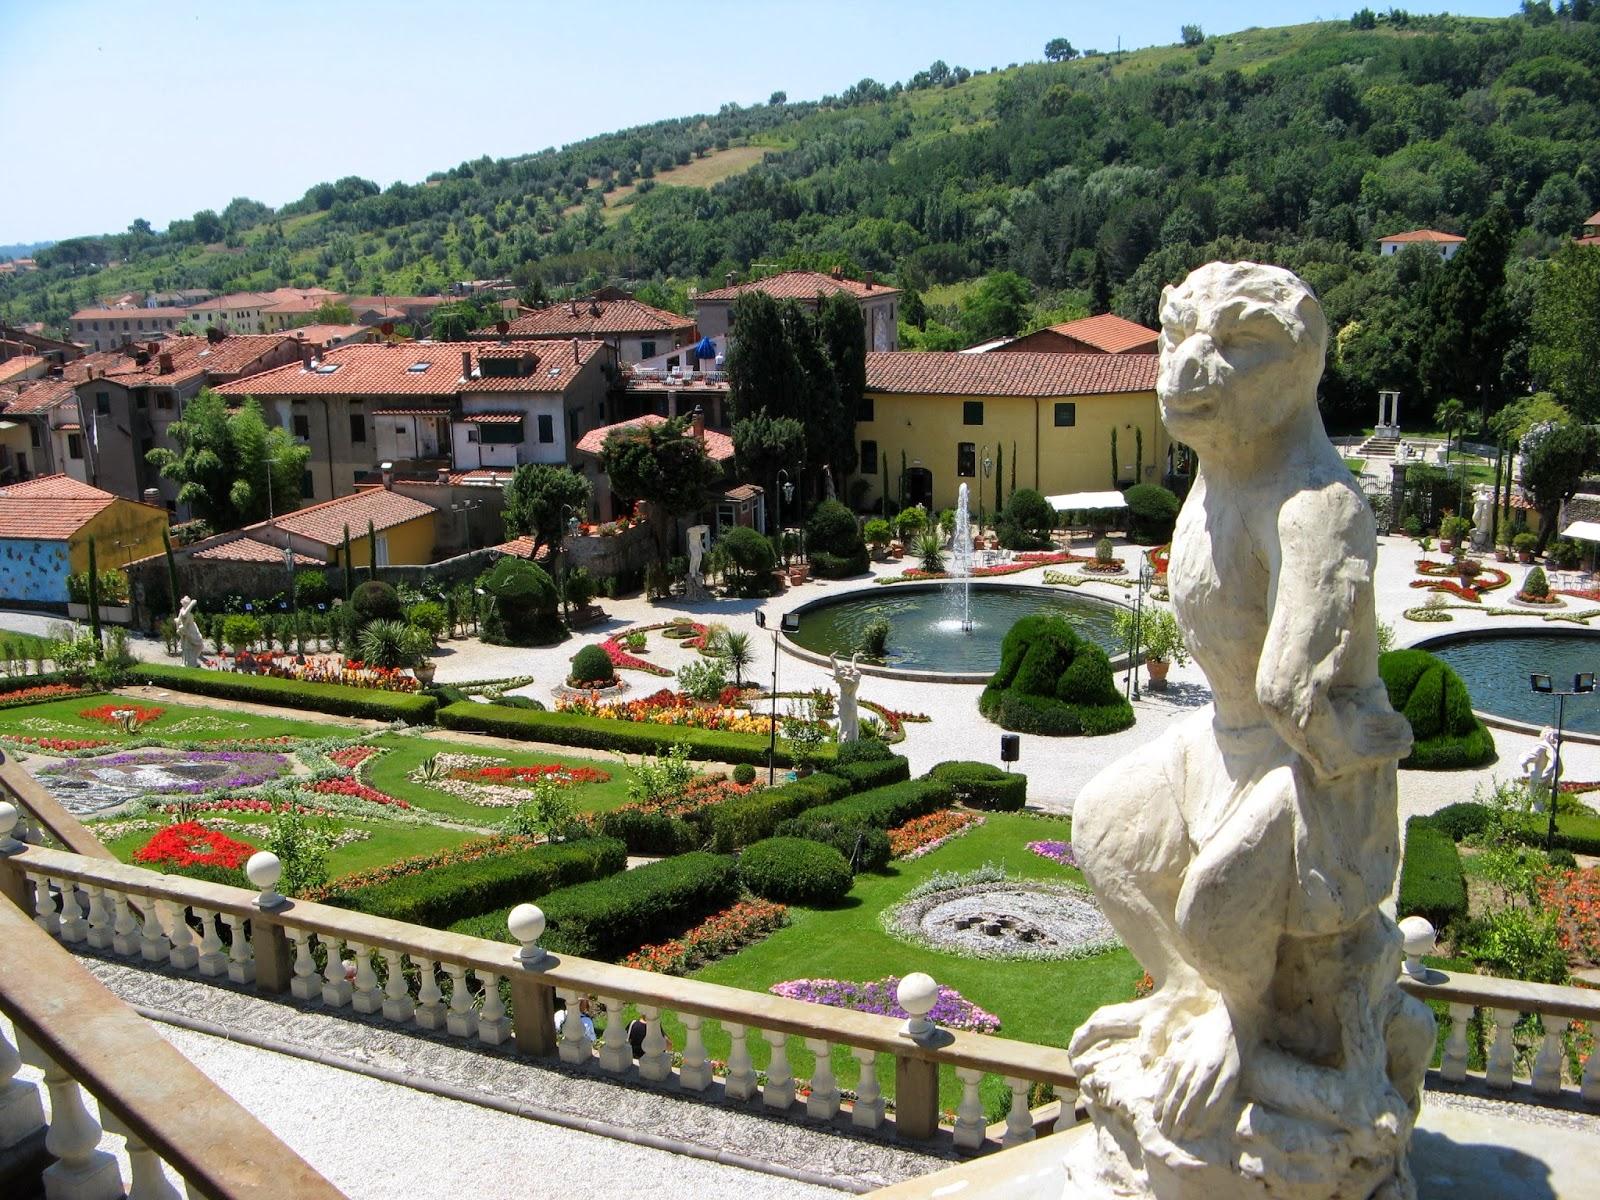 La villa de Collodi en la Toscana italiana